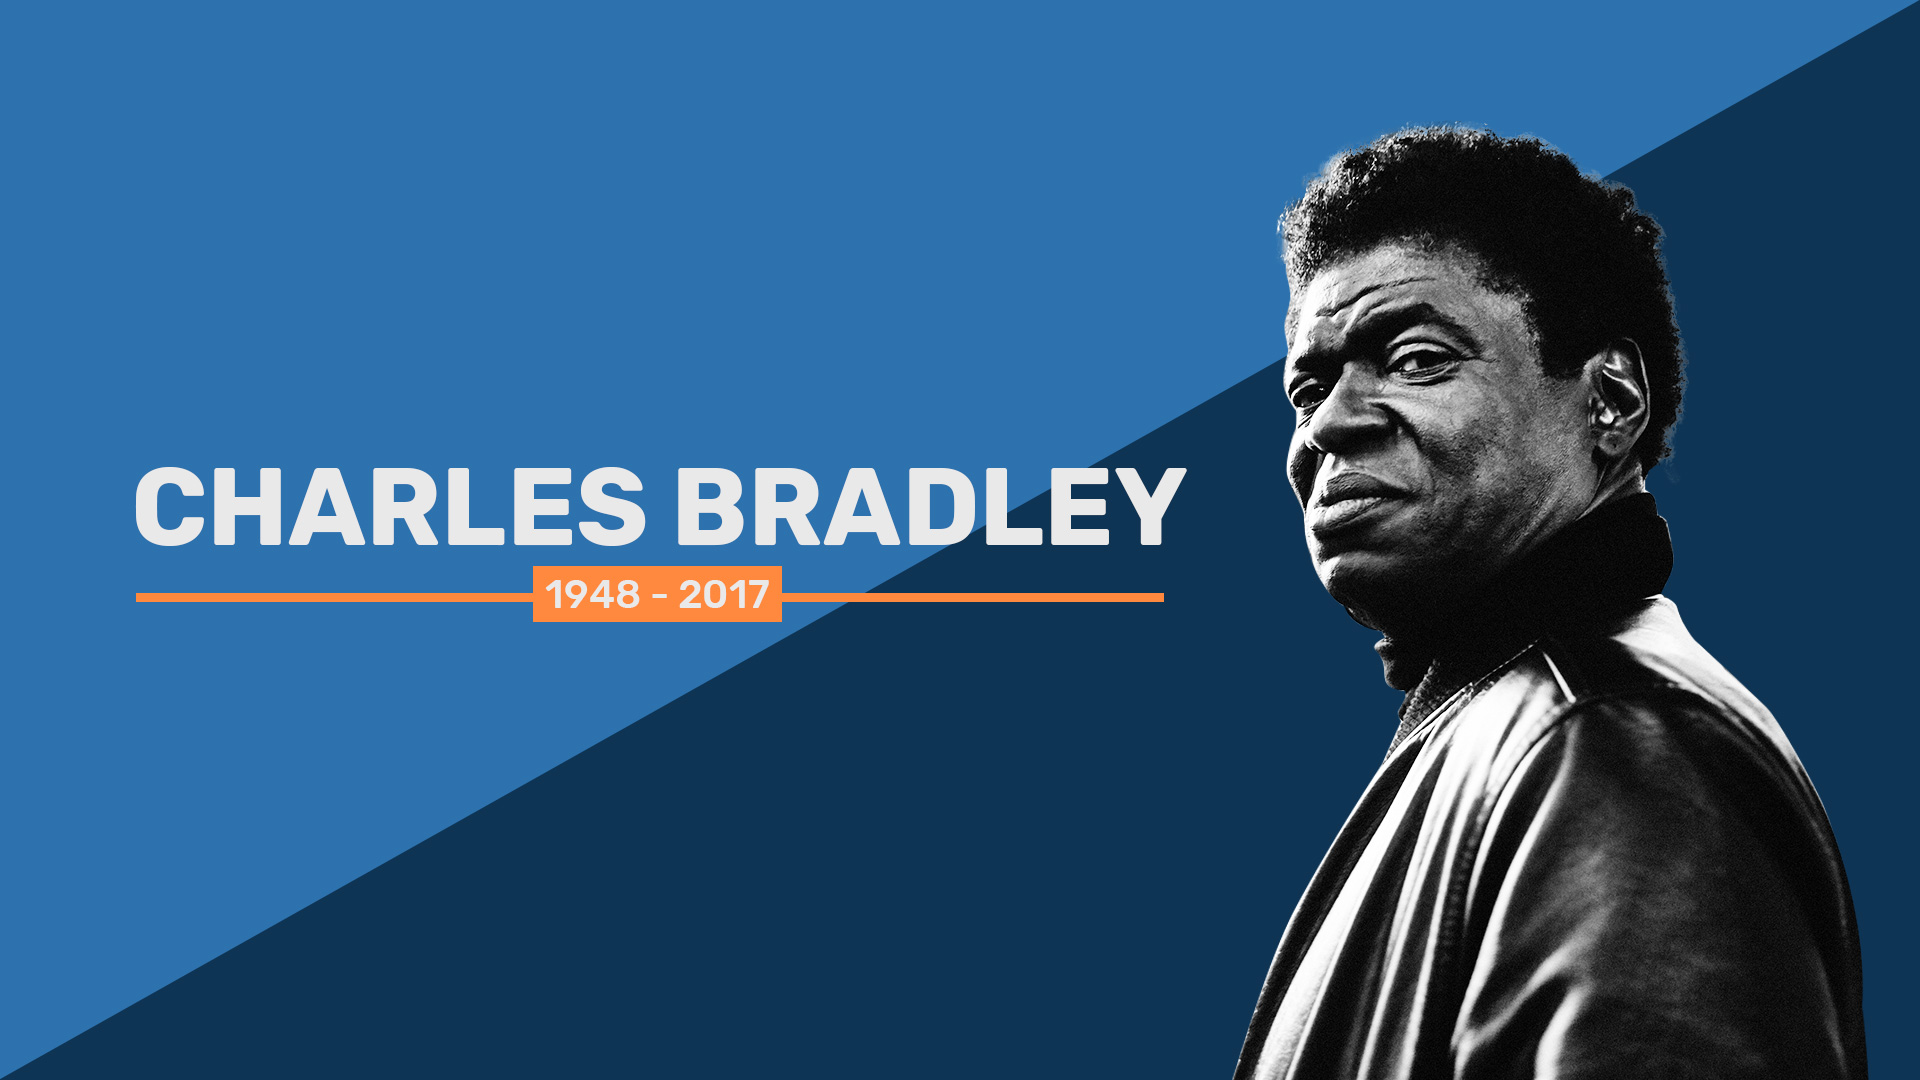 Goodbye Charles Bradley, The Screaming Eagle of Soul